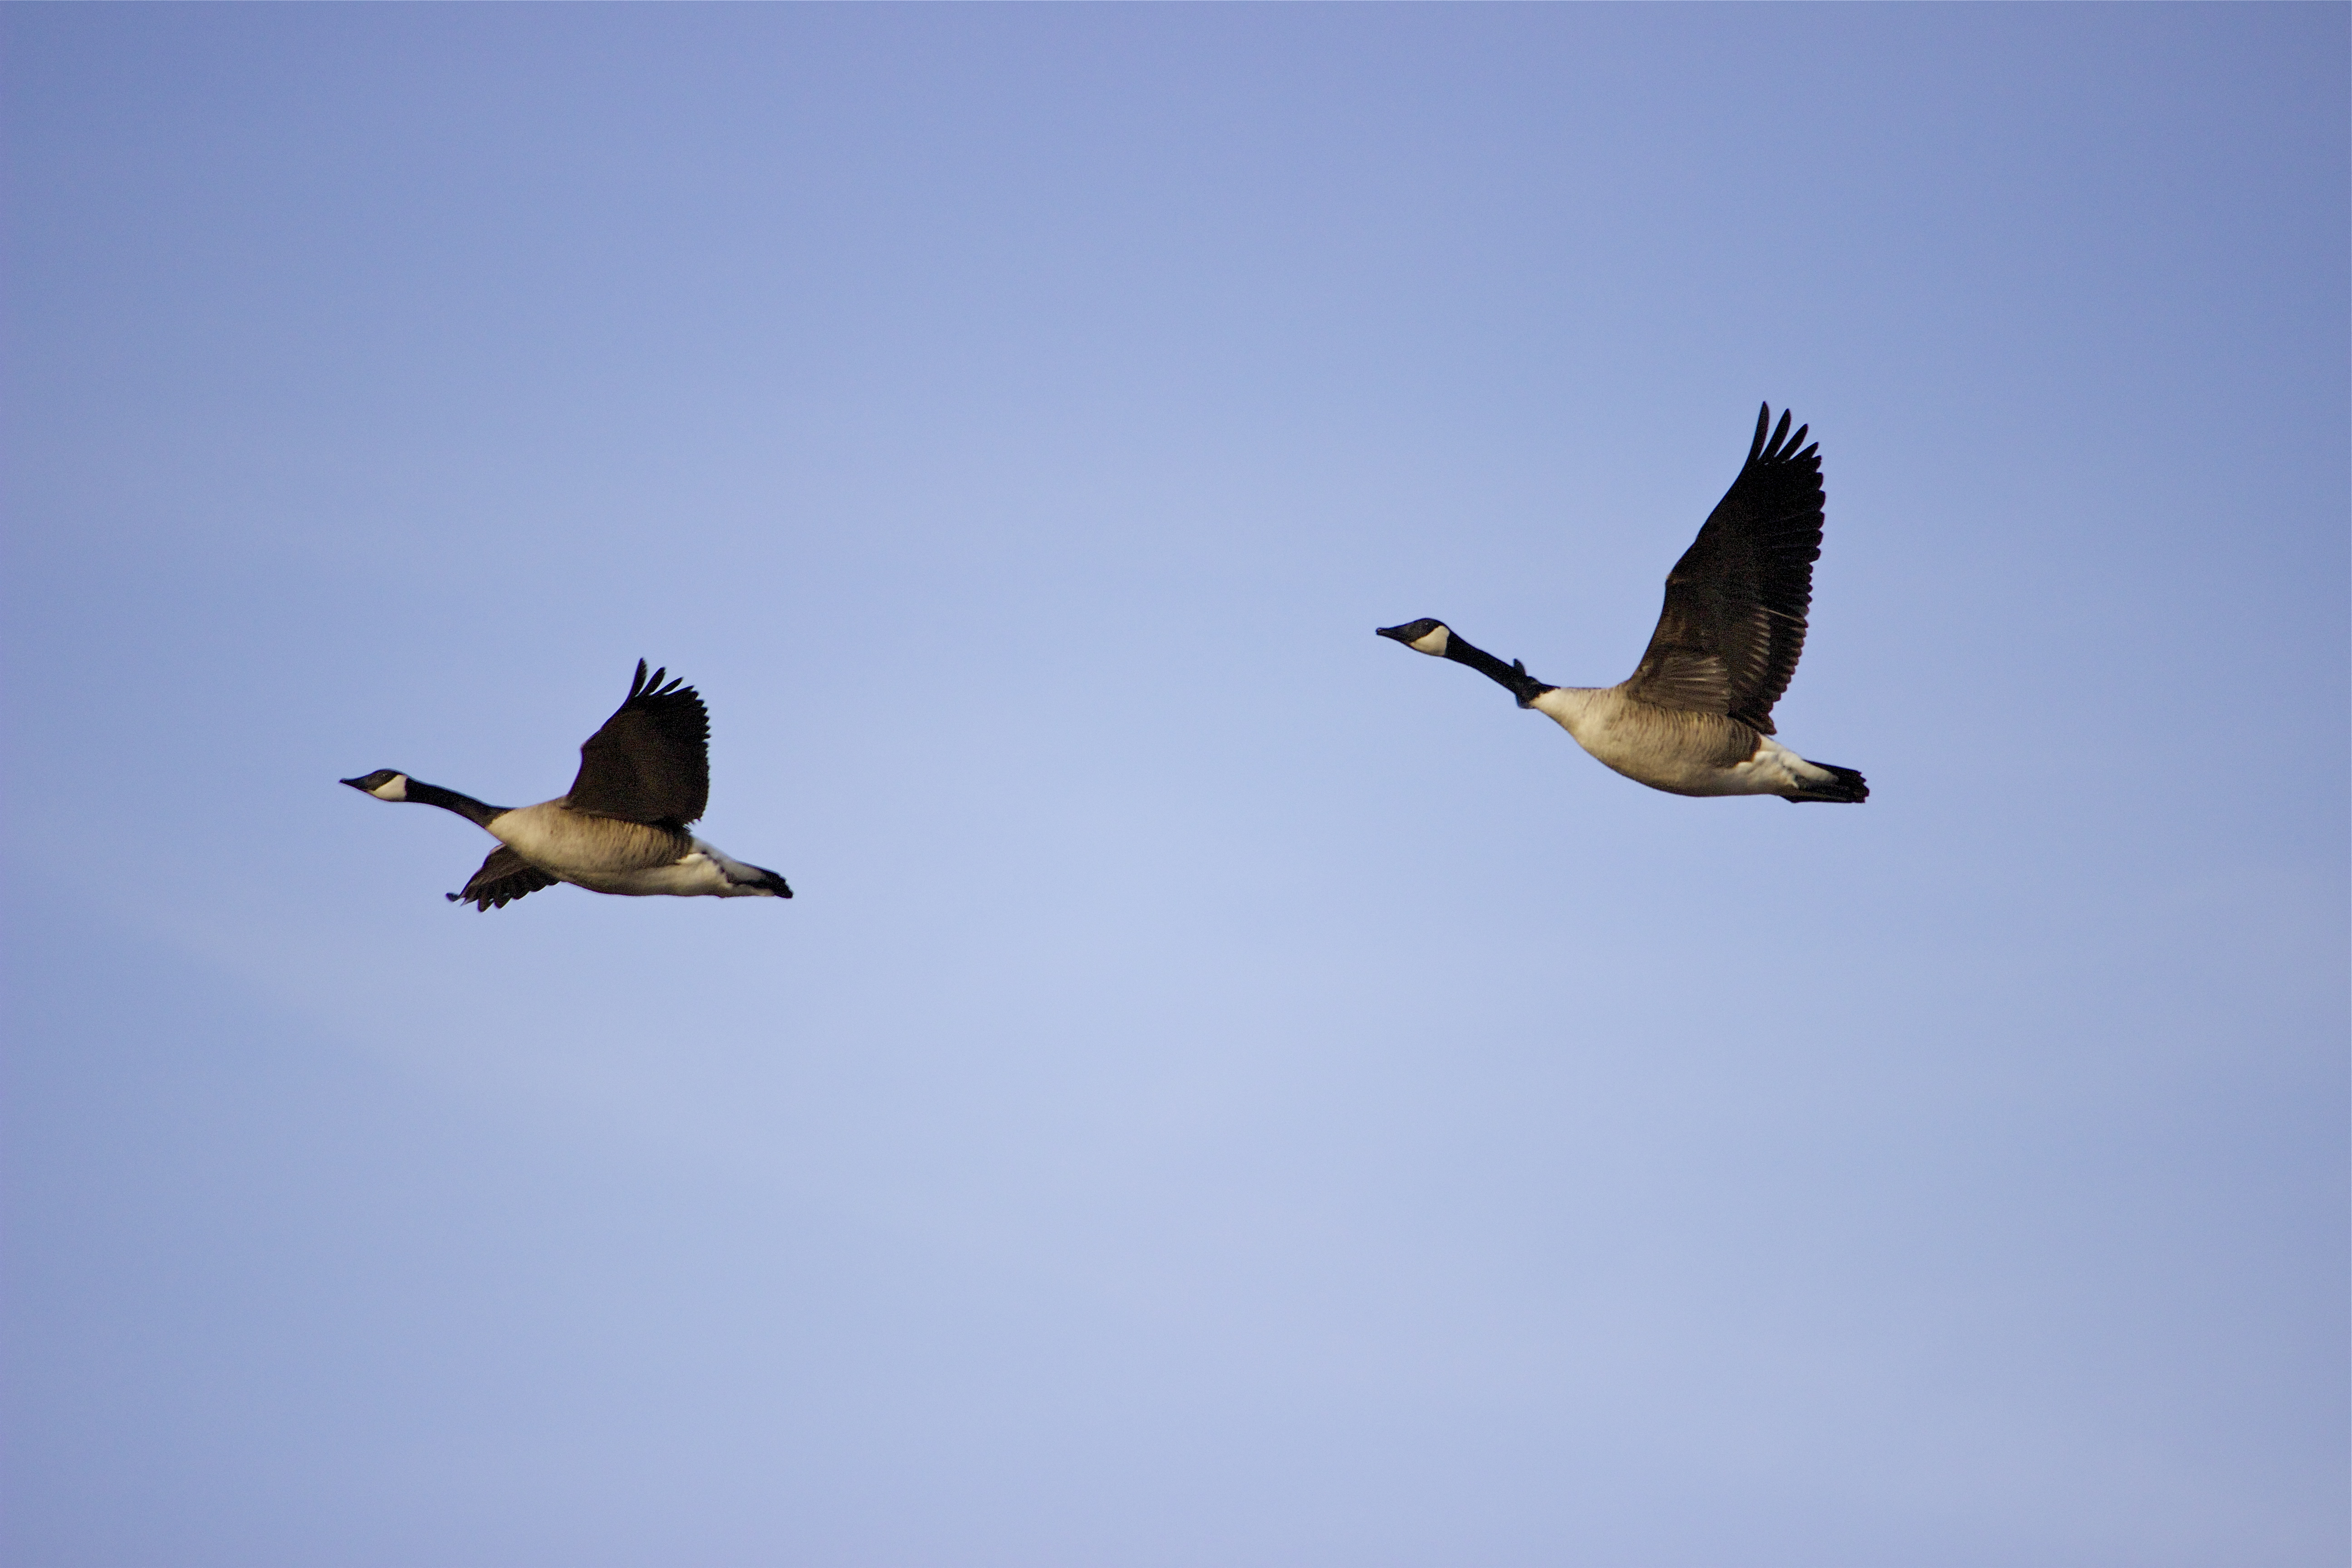 Canadian geese (Branta canadensis)